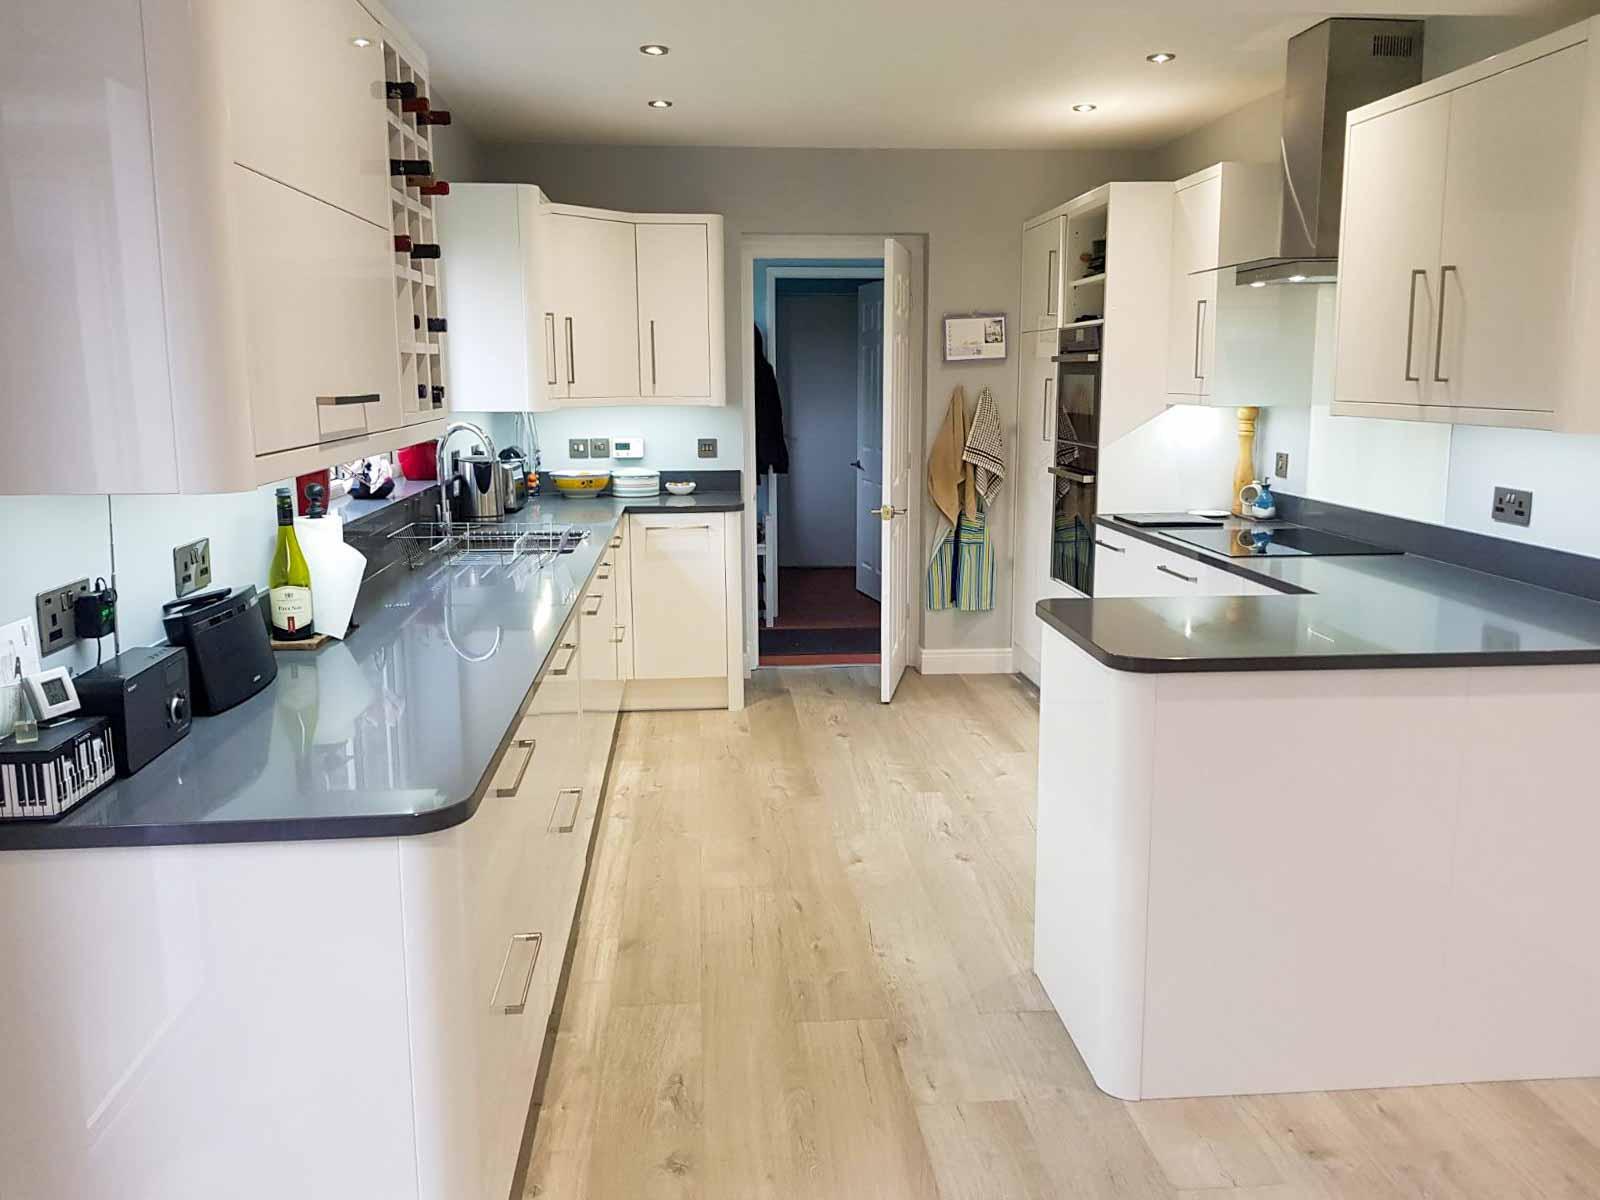 Plaistowe Kitchen